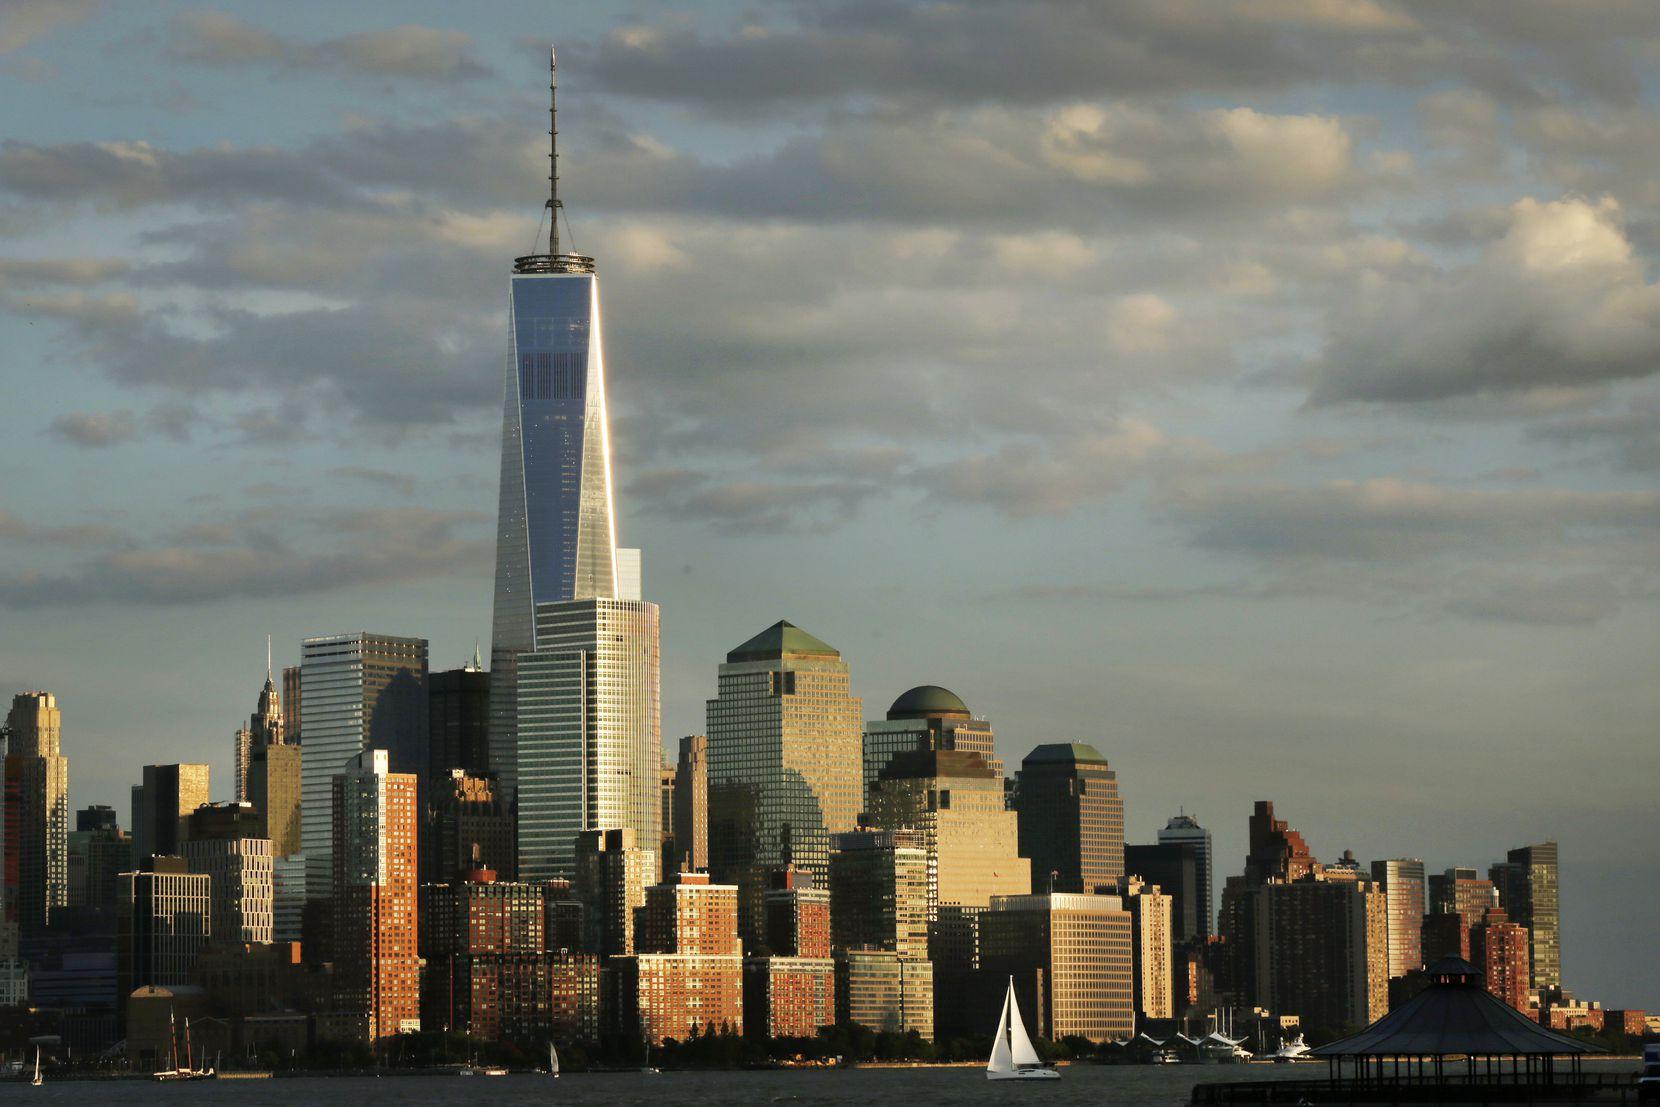 1 World Trade Center towers above the lower Manhattan skyline in New York.